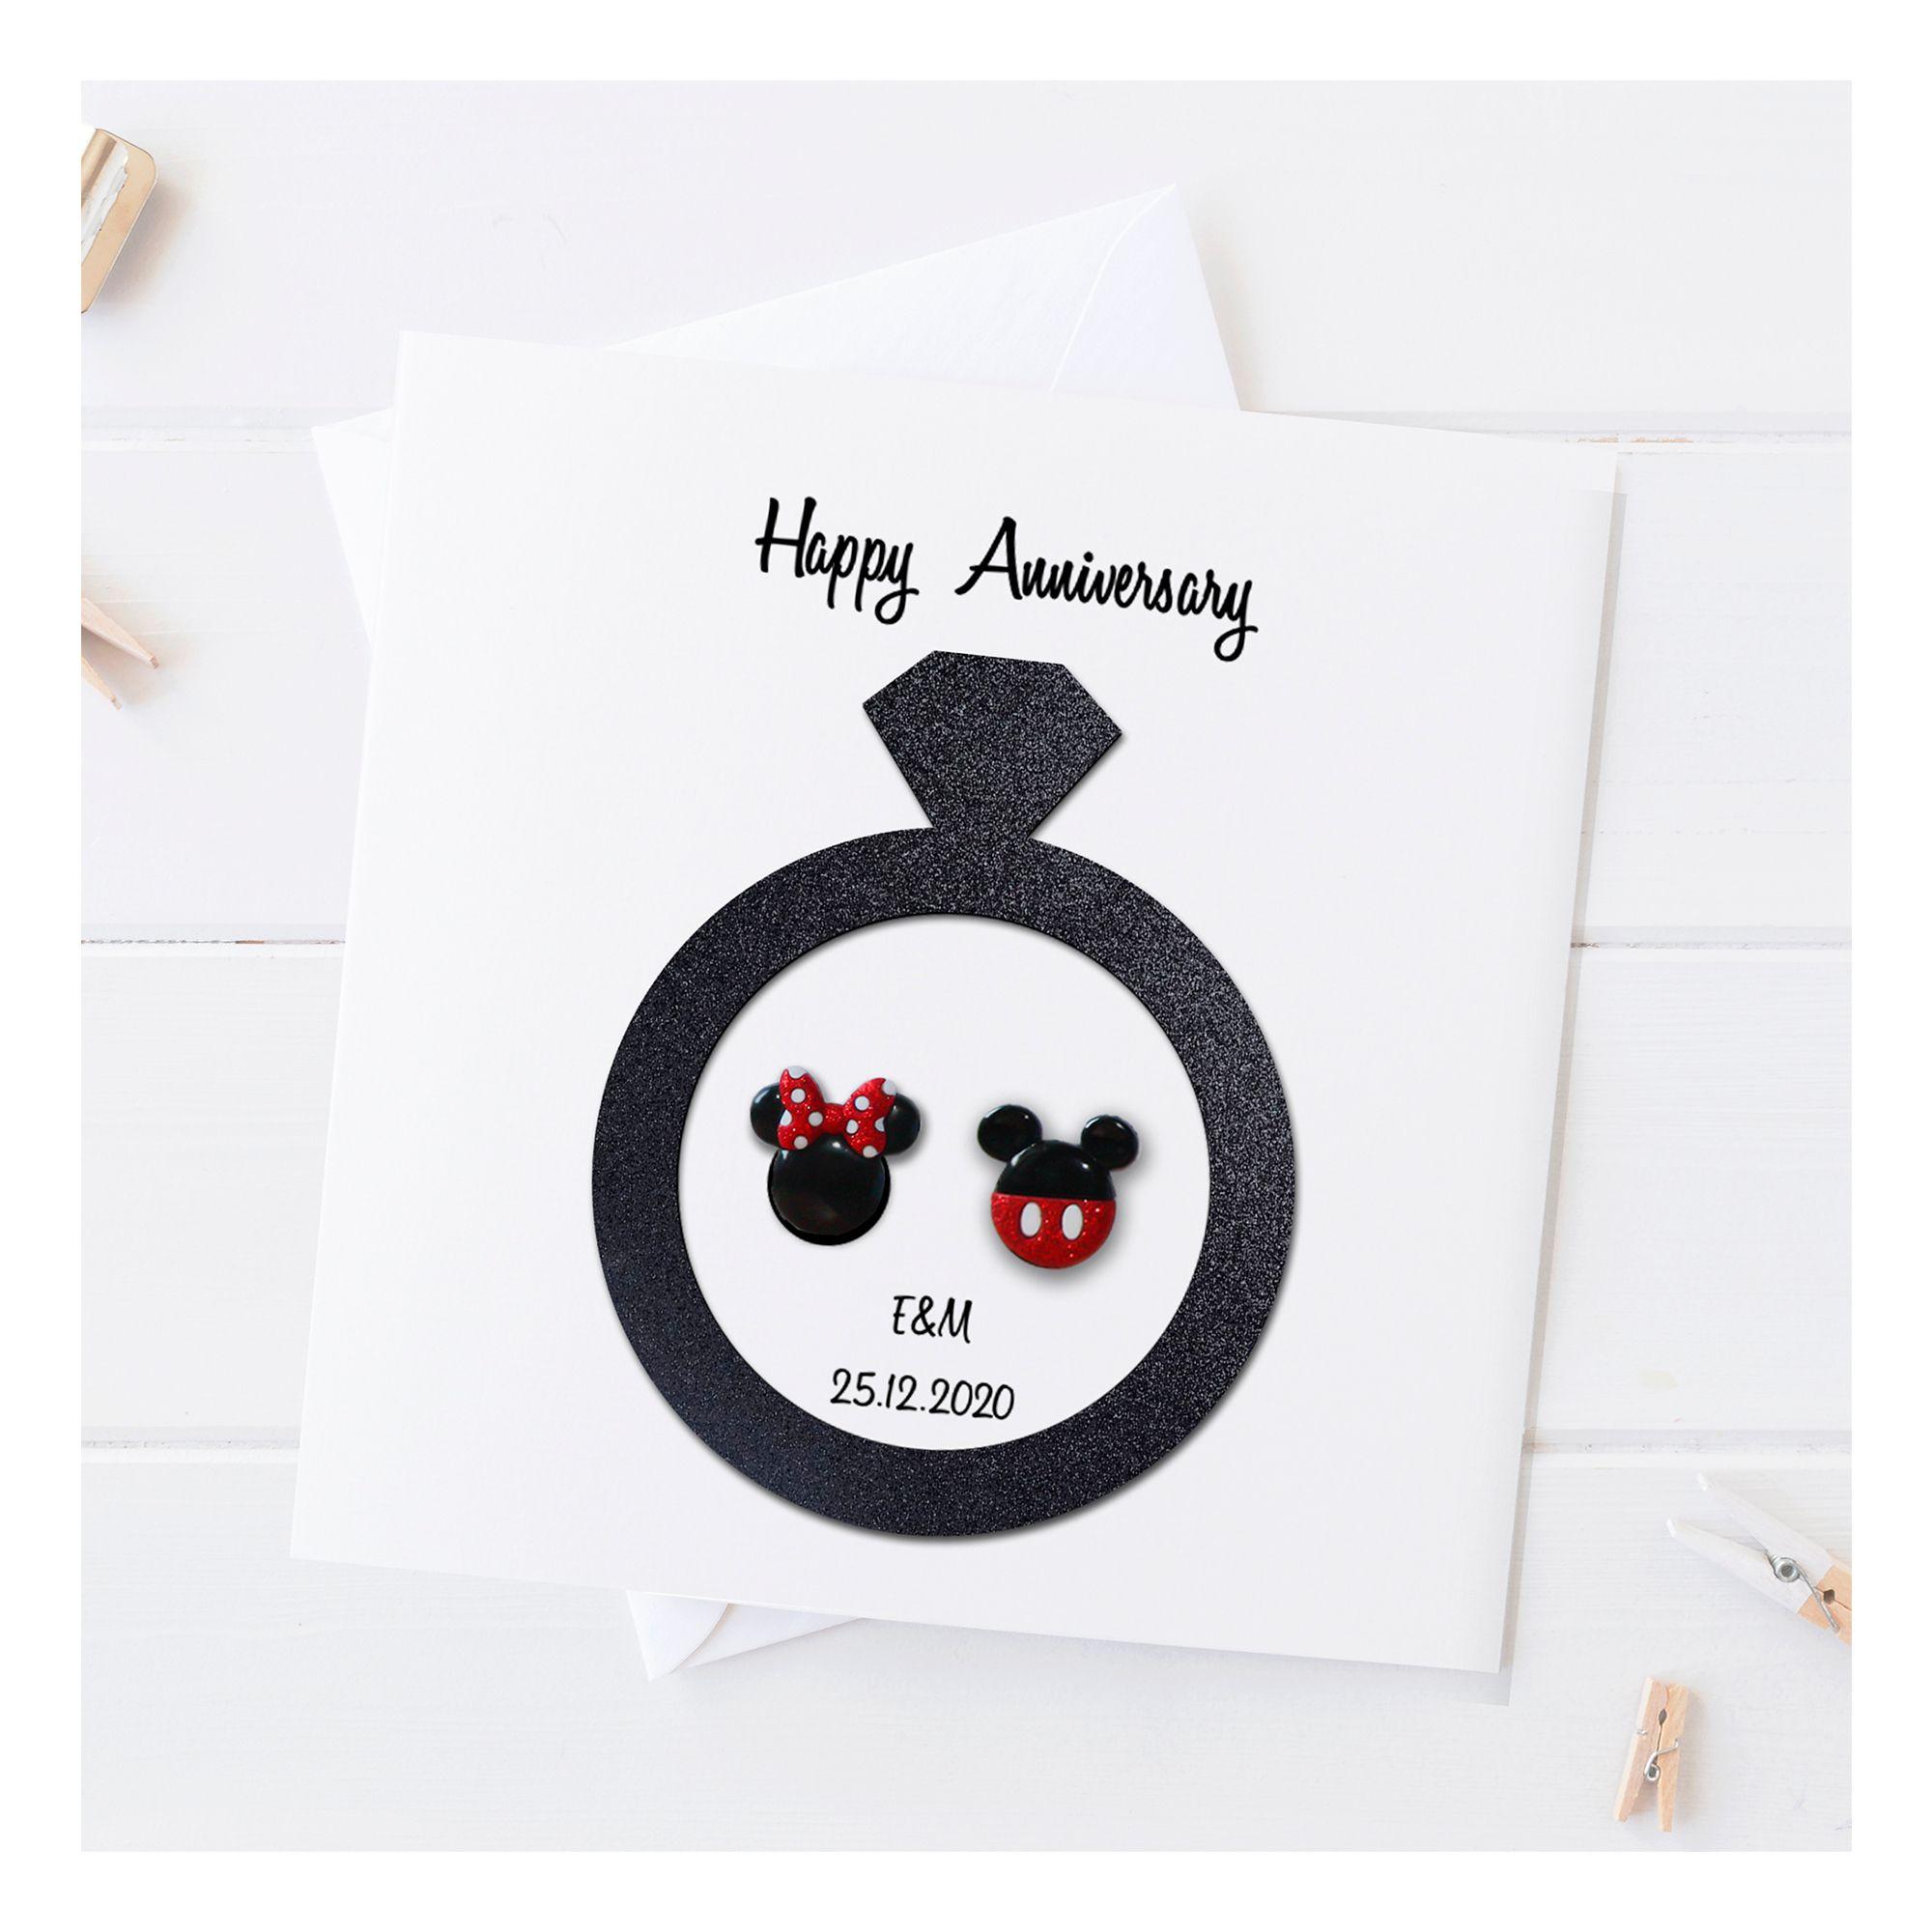 Mickey Minnie Anniversary Card Disney Anniversary Card Etsy Anniversary Cards For Boyfriend Anniversary Cards Handmade Anniversary Card For Parents